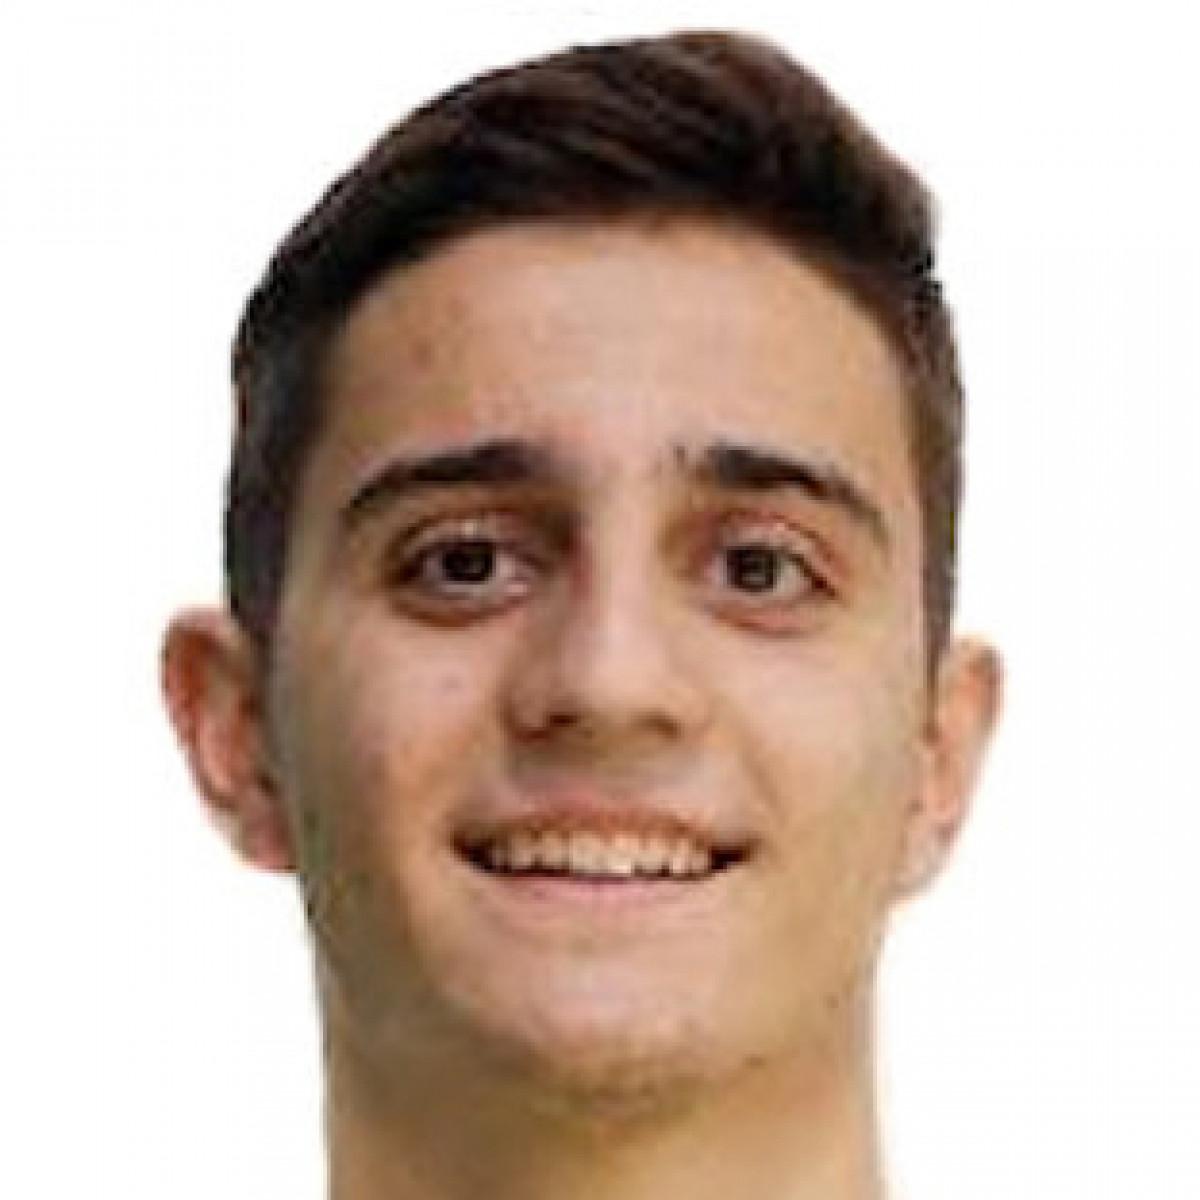 Lucas Munoz